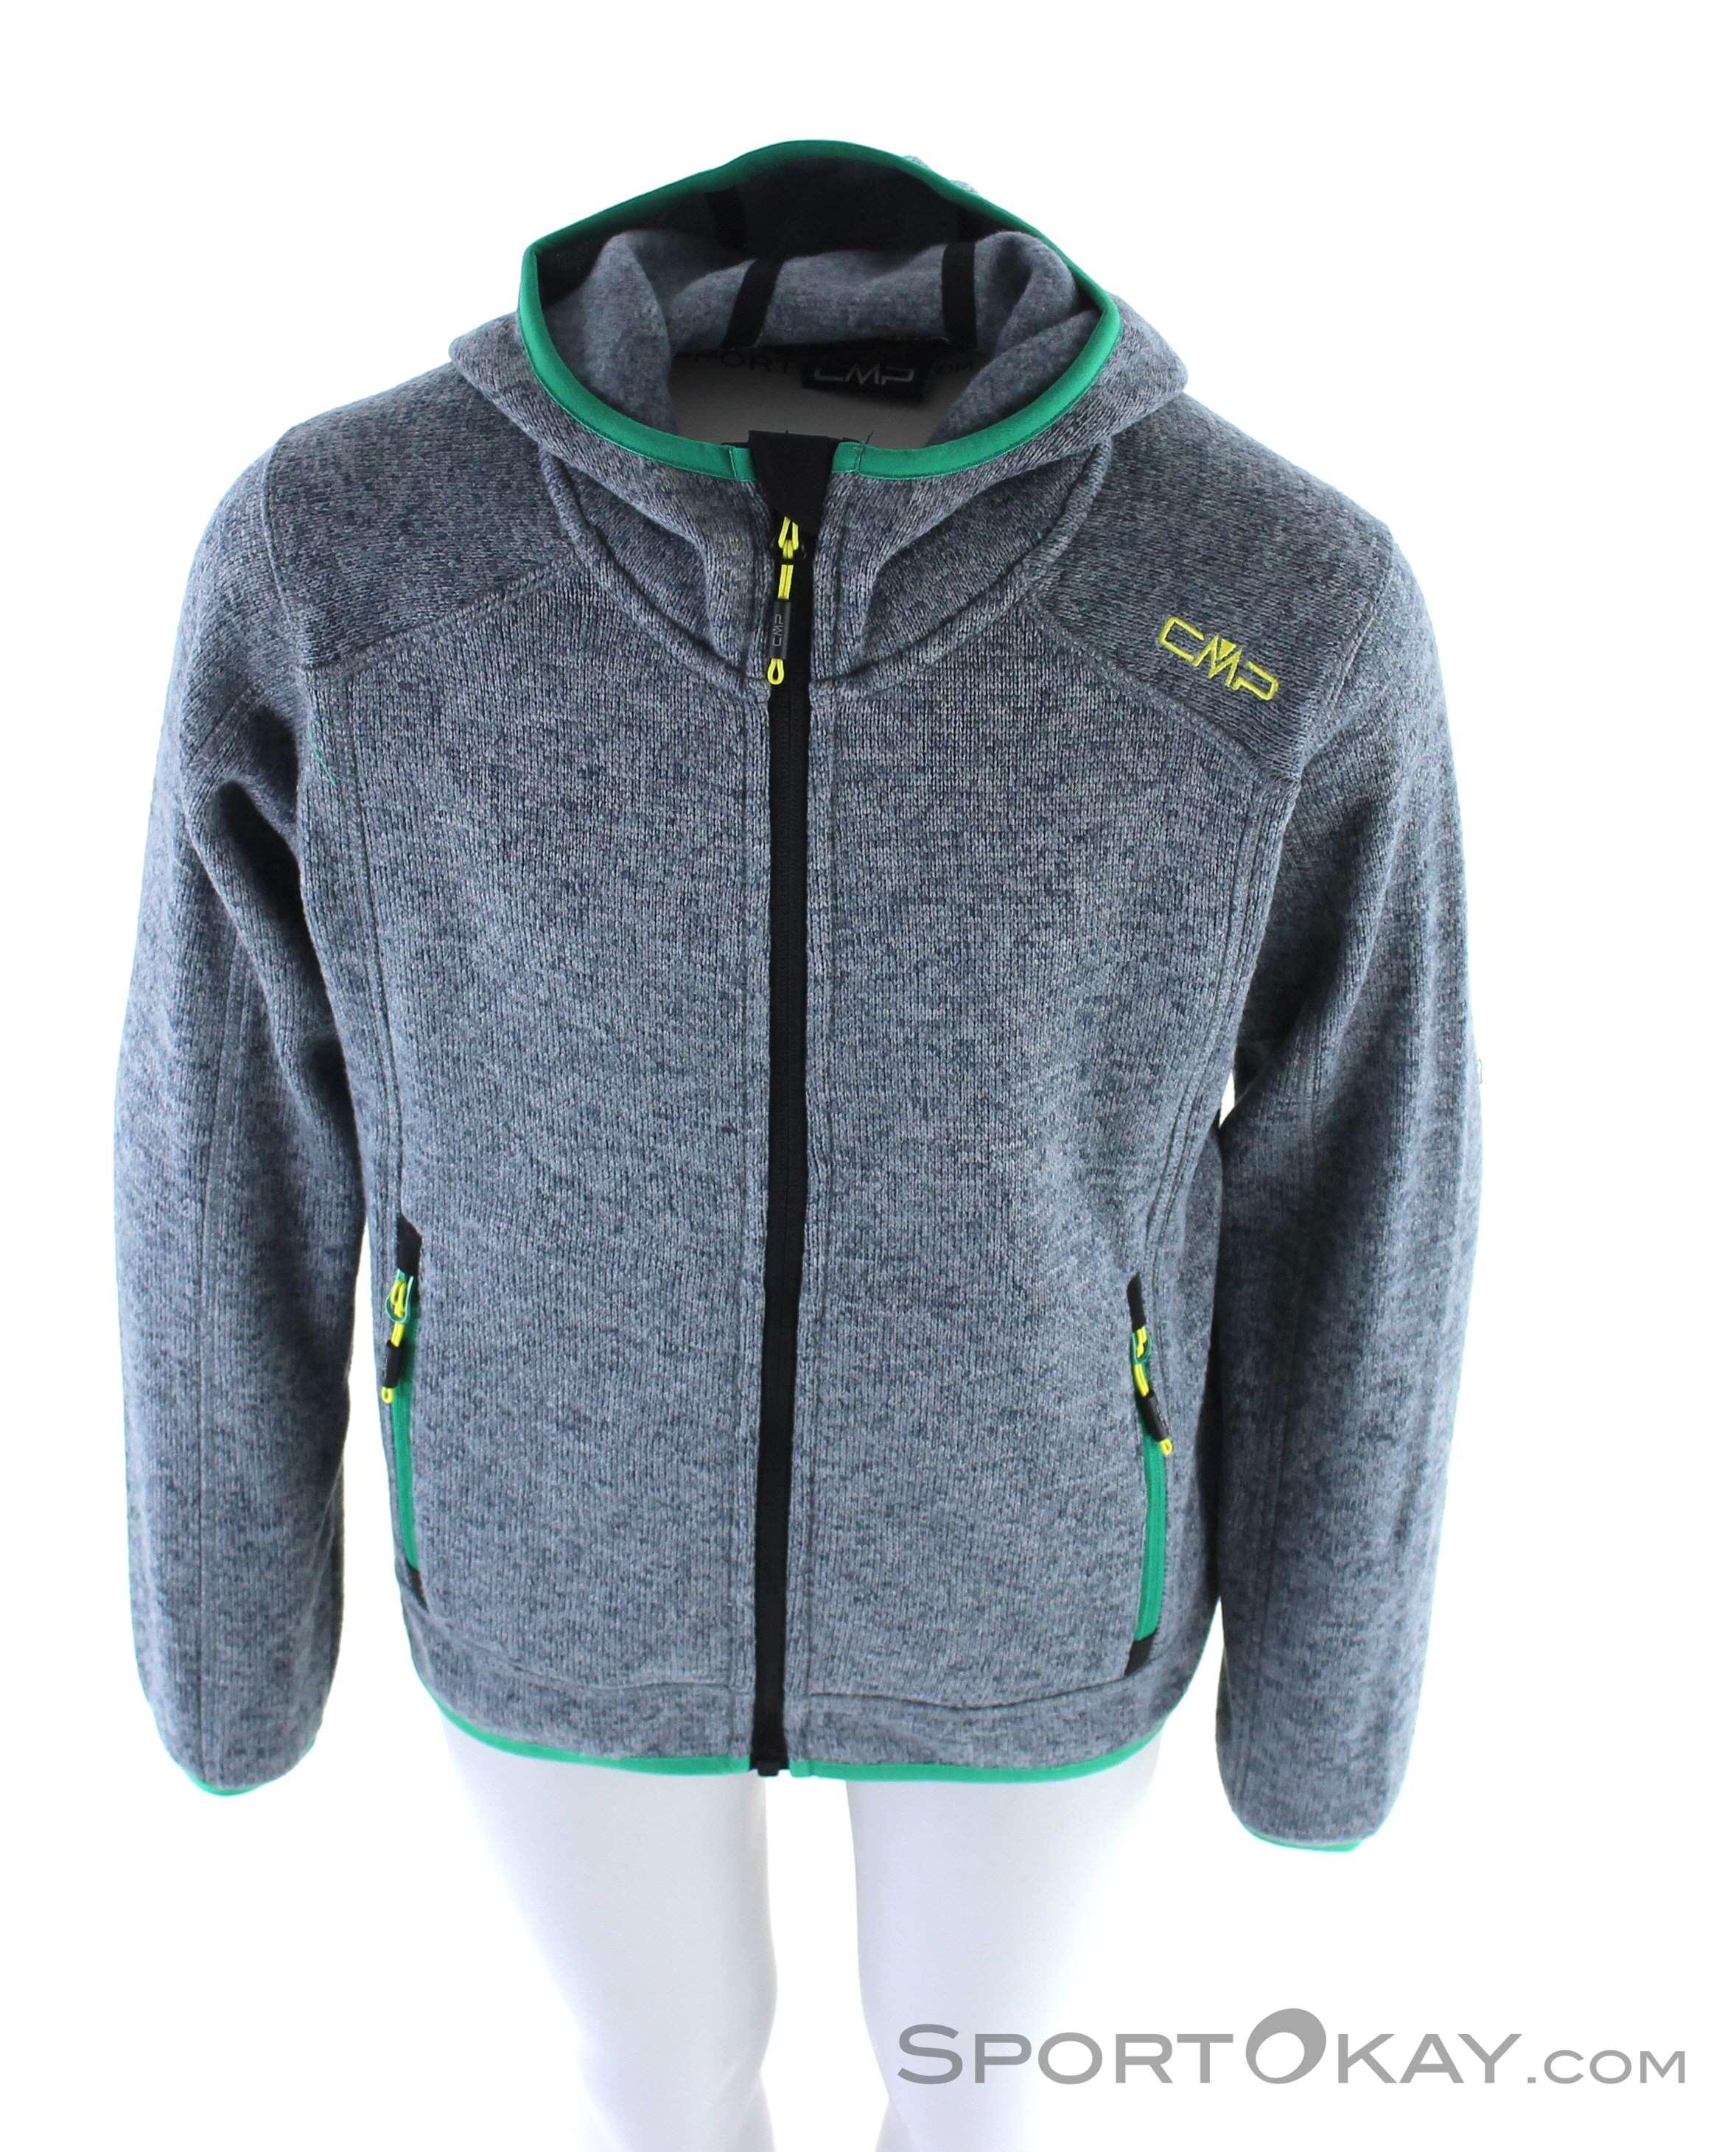 b35dd18571 CMP Fleece Kids Fleece Jacket - Jackets - Outdoor Clothing - Outdoor ...